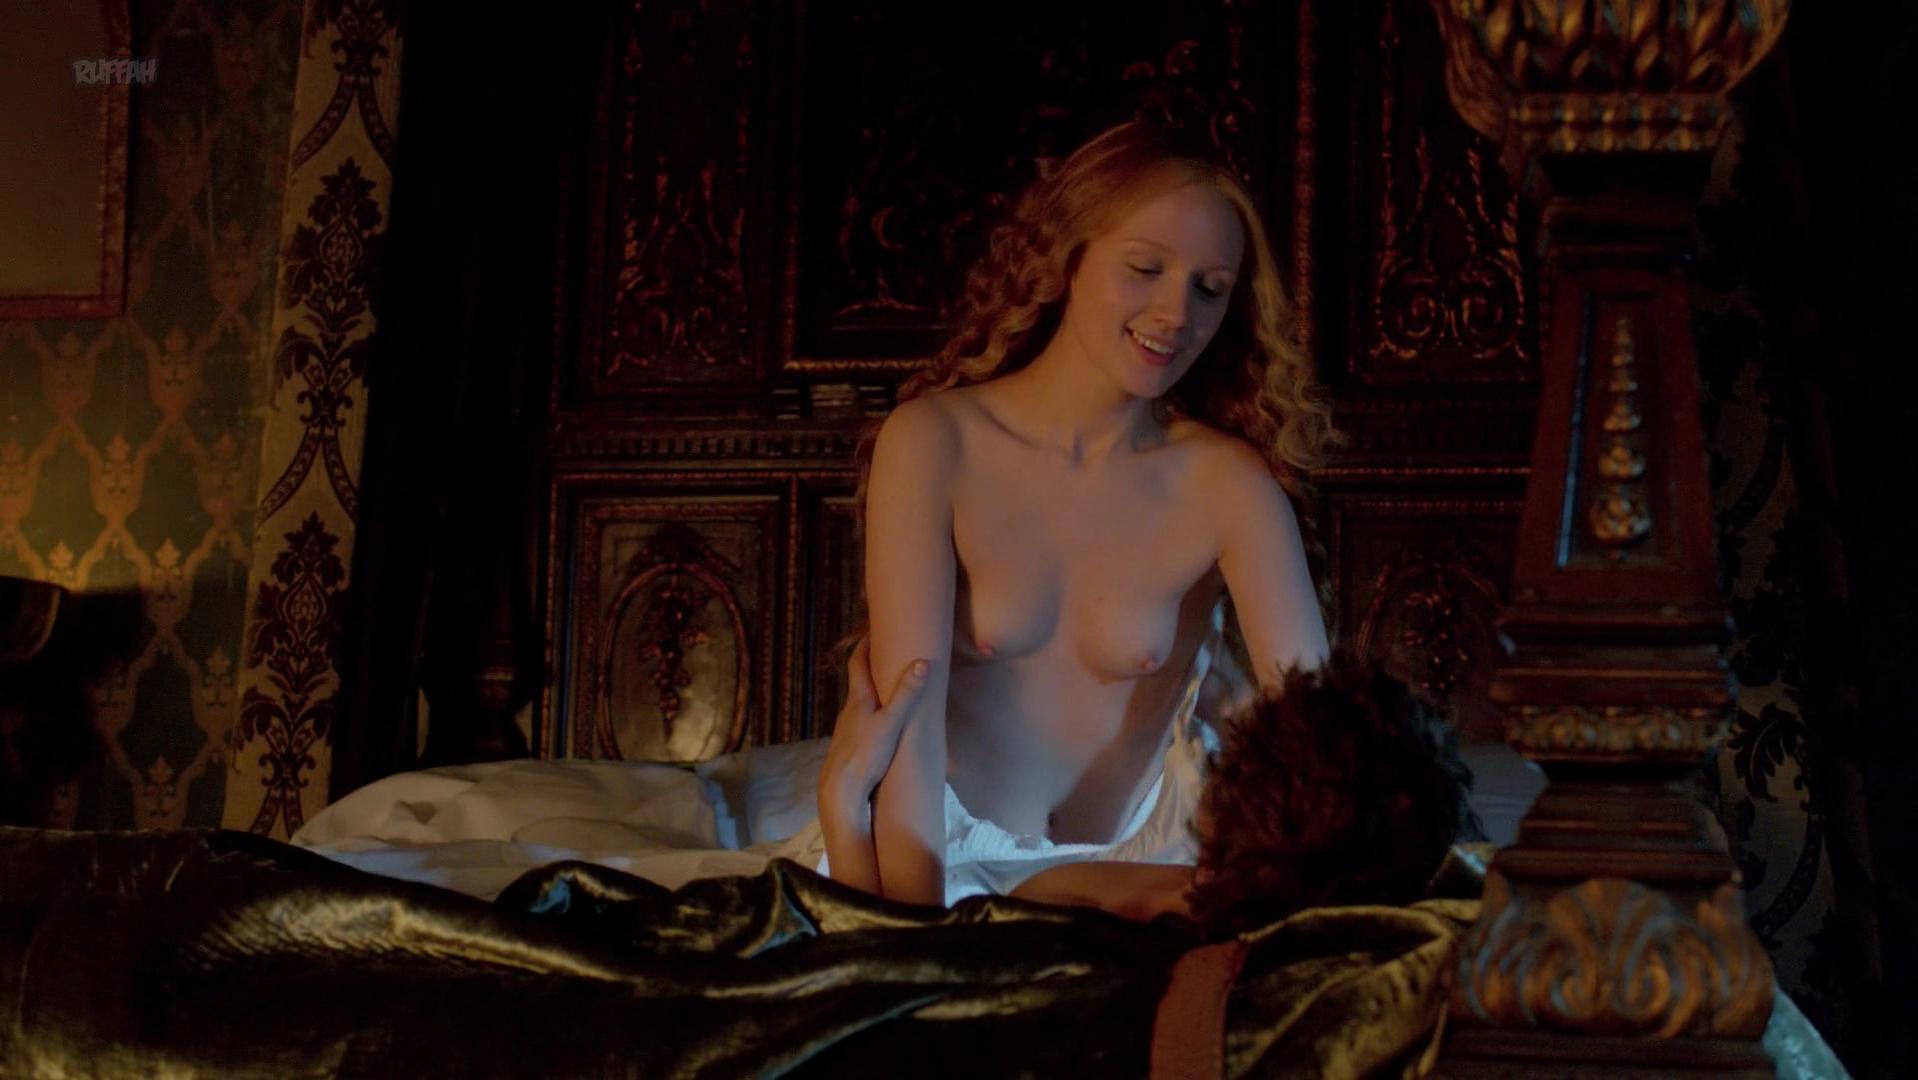 Topless Topless Emily Berrington  nudes (92 fotos), Facebook, cleavage